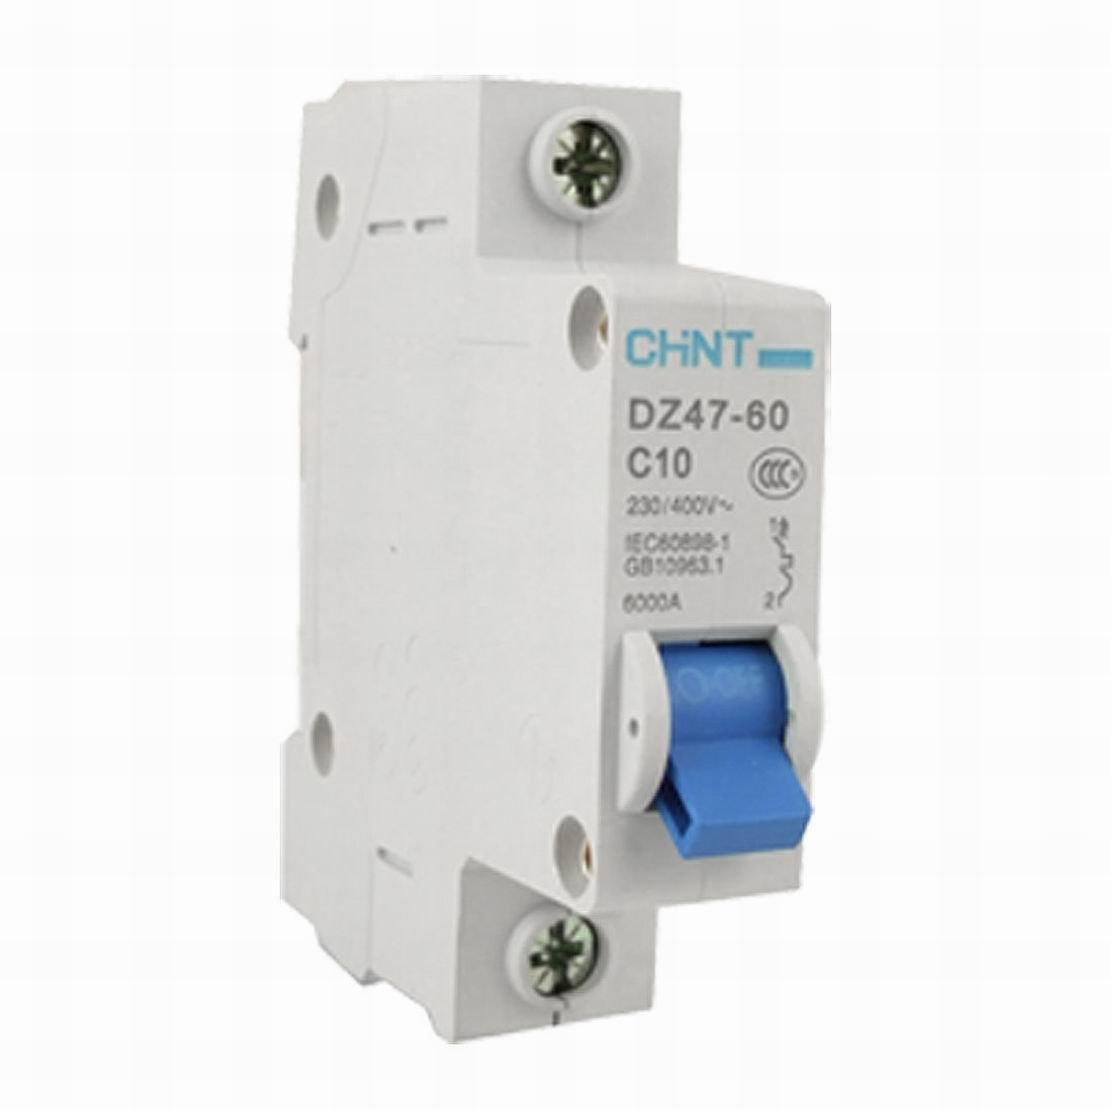 DZ47-60 C10 1P 10A  AC230//400V  Household Mini Circuit Breaker Air Switch